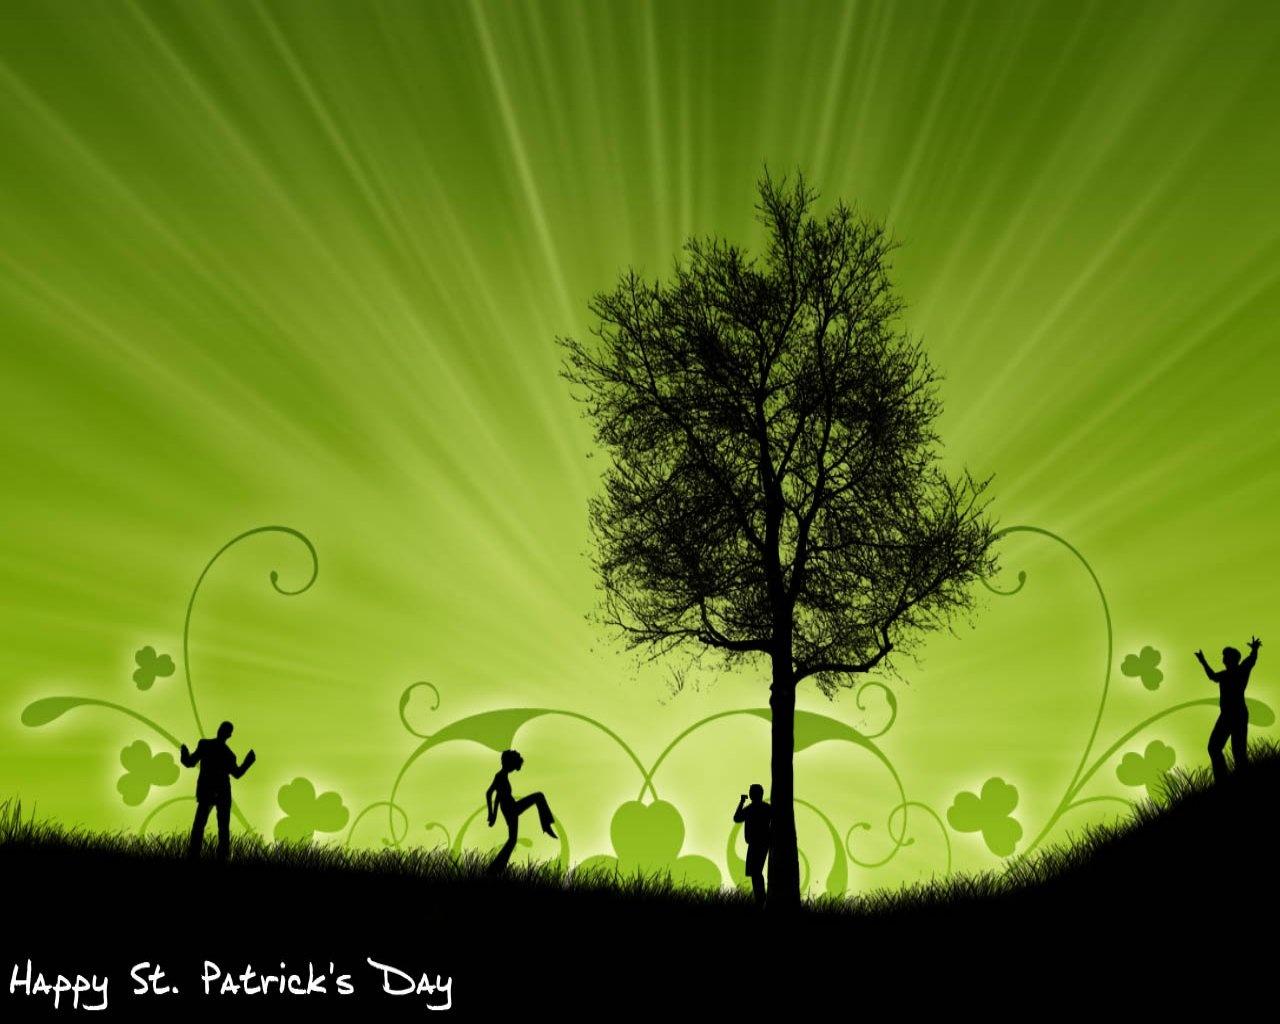 happy st patricks day wallpapersuggestcom wallpapers st patricks day 1280x1024